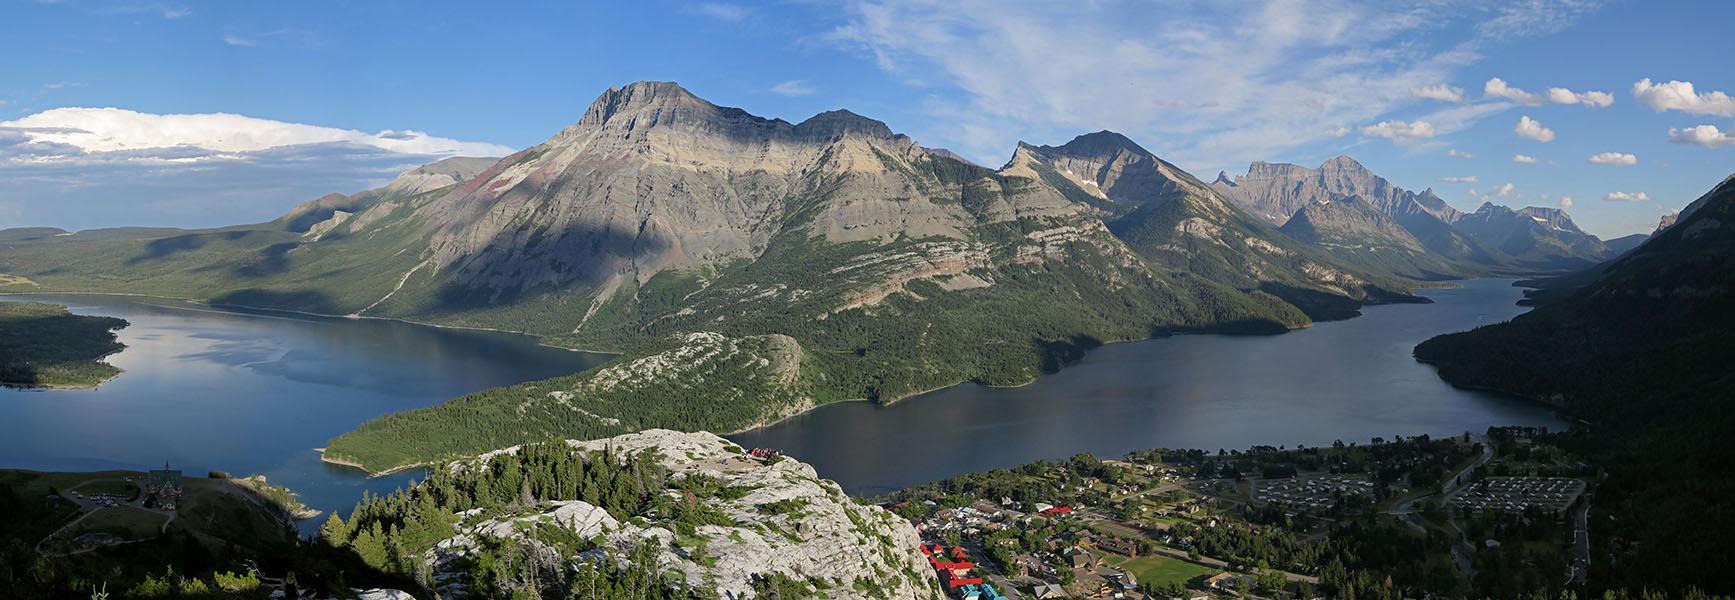 Waterton Lakes panorama [Bear's Hump Trail, Waterton Lakes National Park, Alberta, Canada]